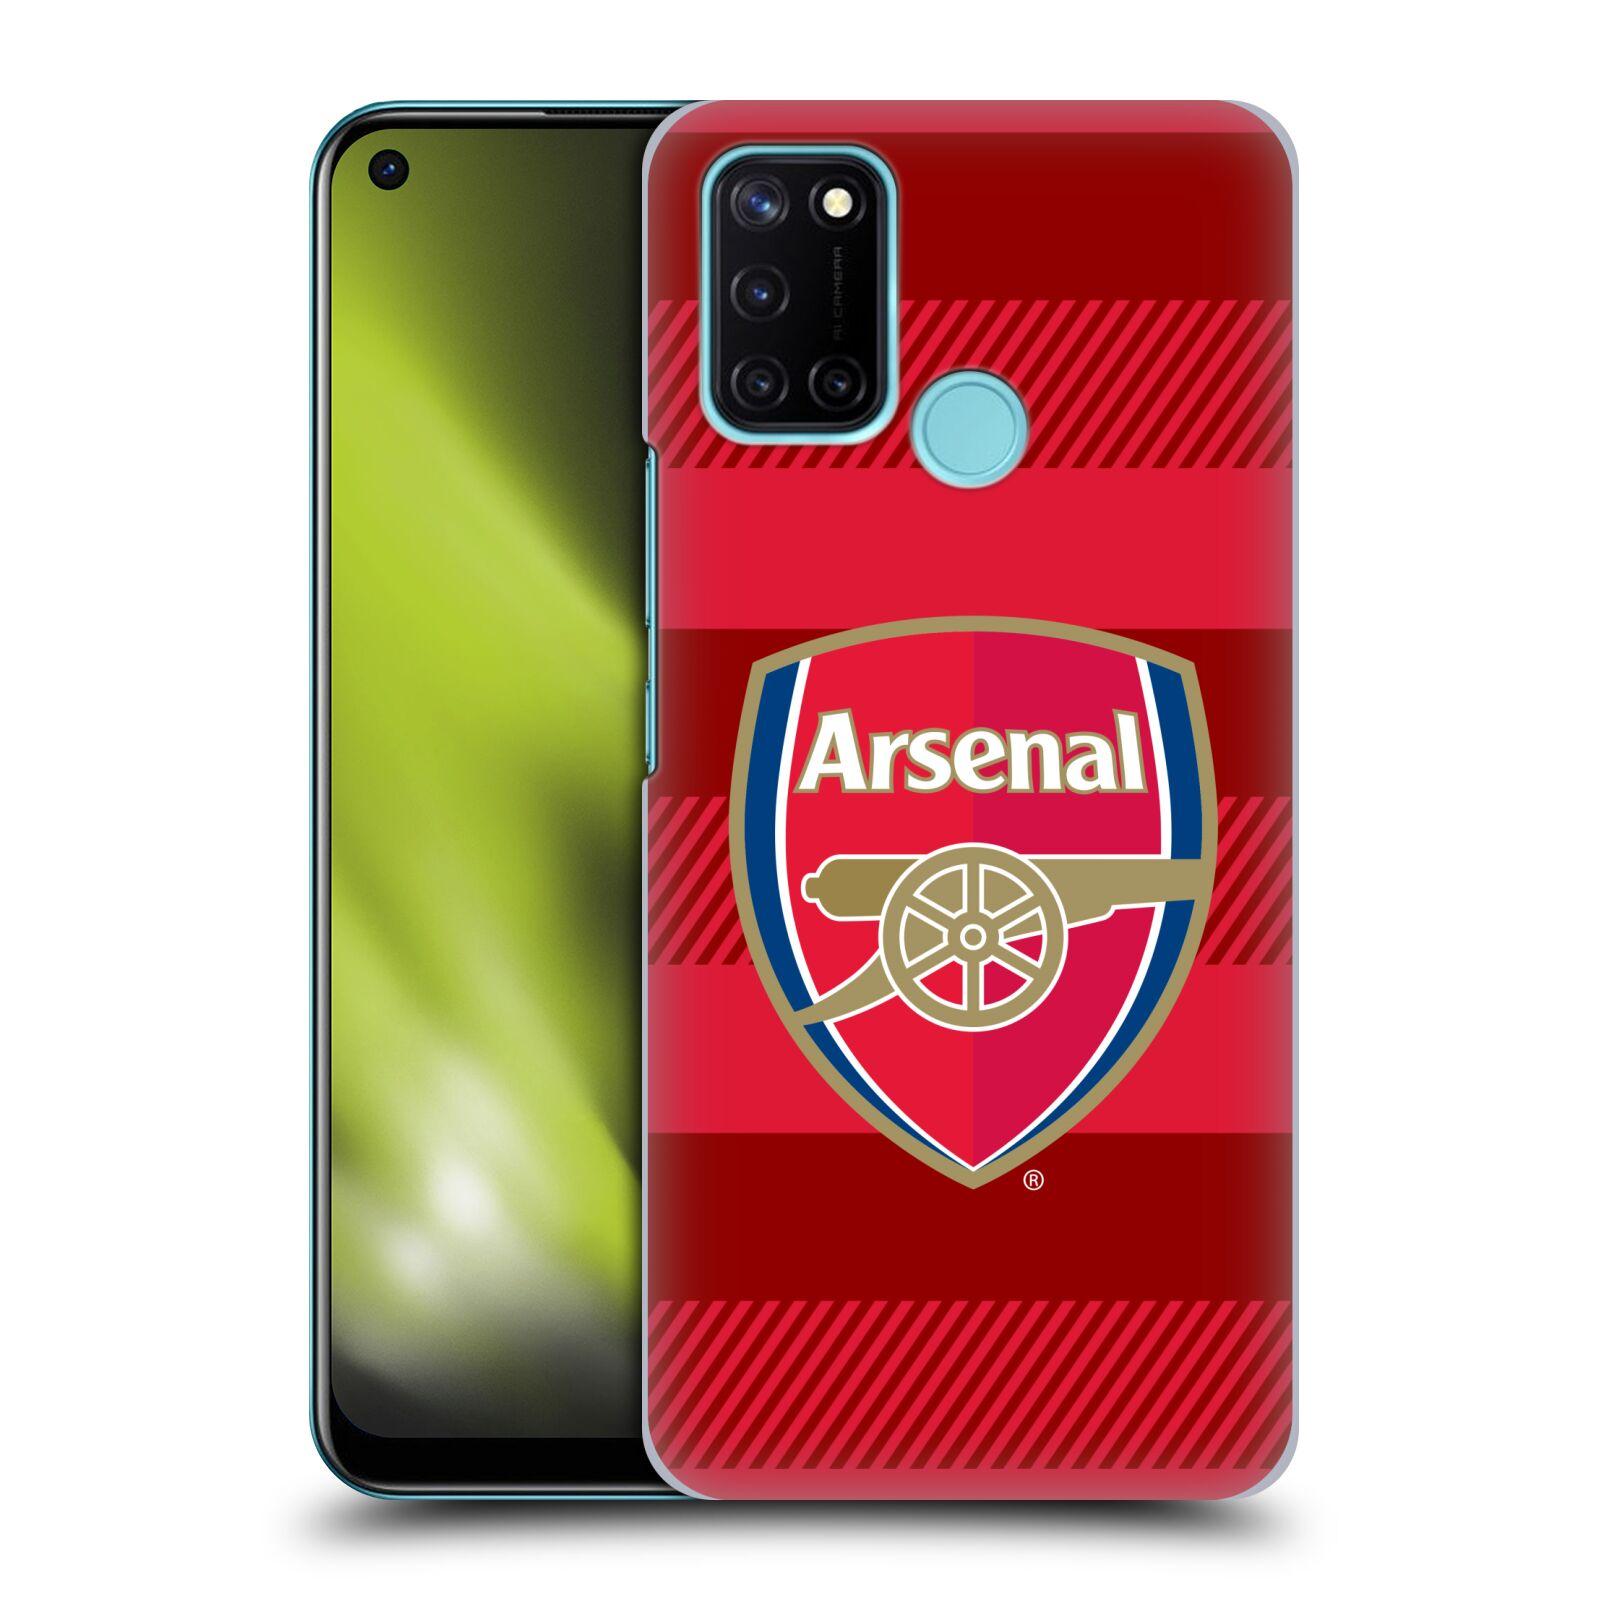 Plastové pouzdro na mobil Realme 7i - Head Case - Arsenal FC - Logo s pruhy